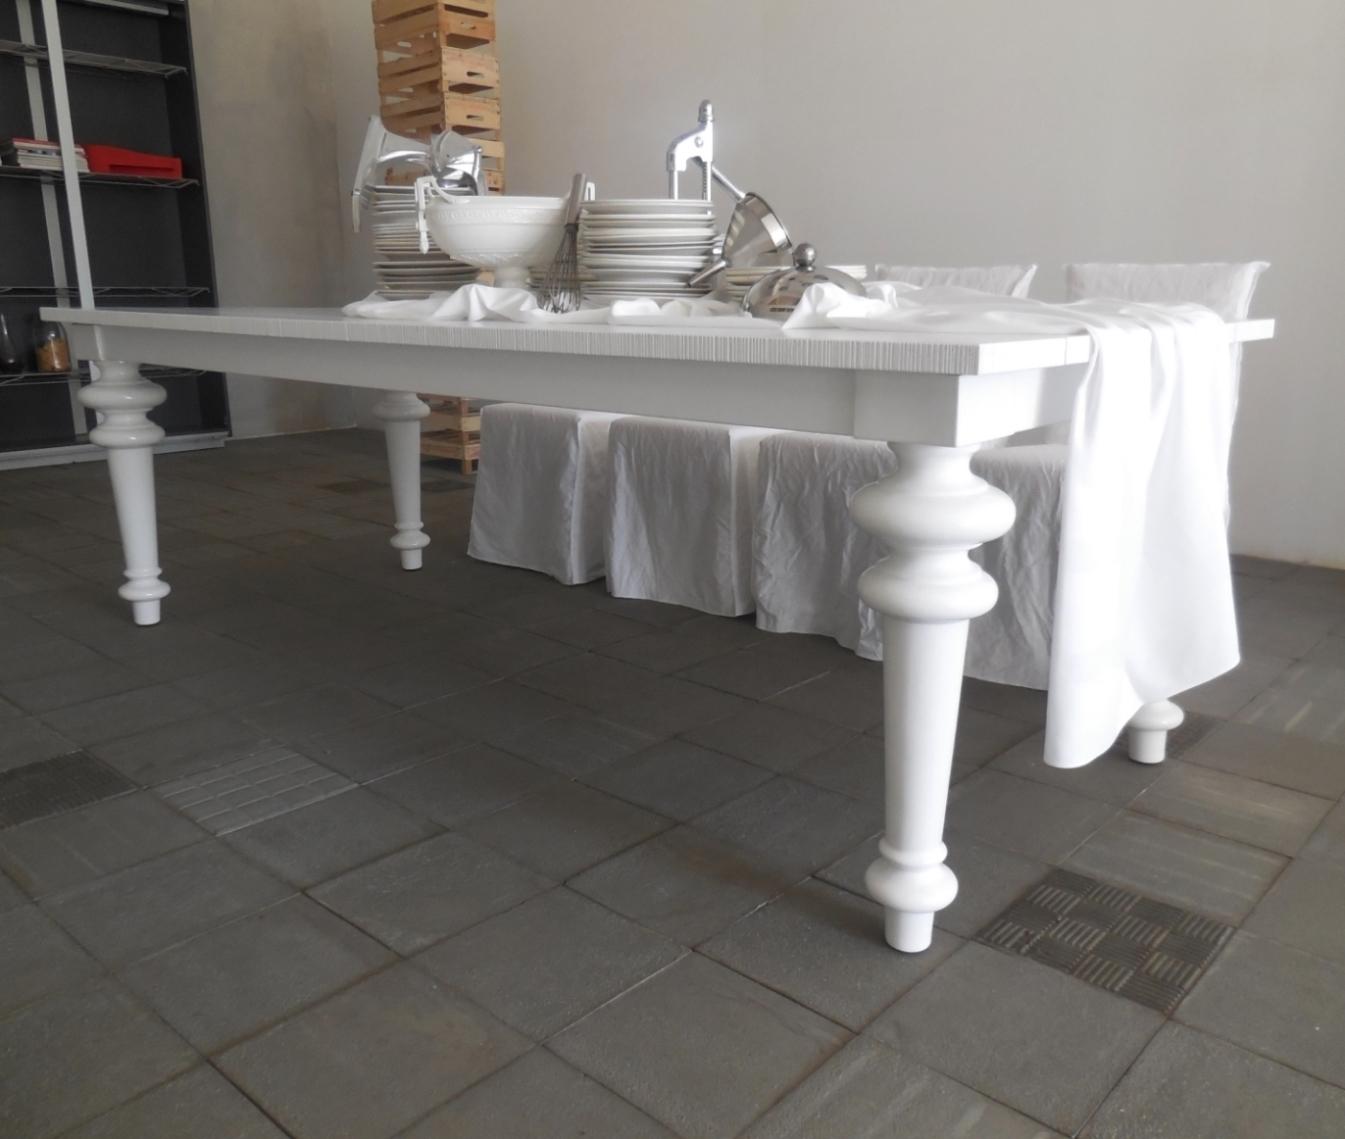 tavolo gervasoni vendita promozionale gervasoni tavolo. Black Bedroom Furniture Sets. Home Design Ideas